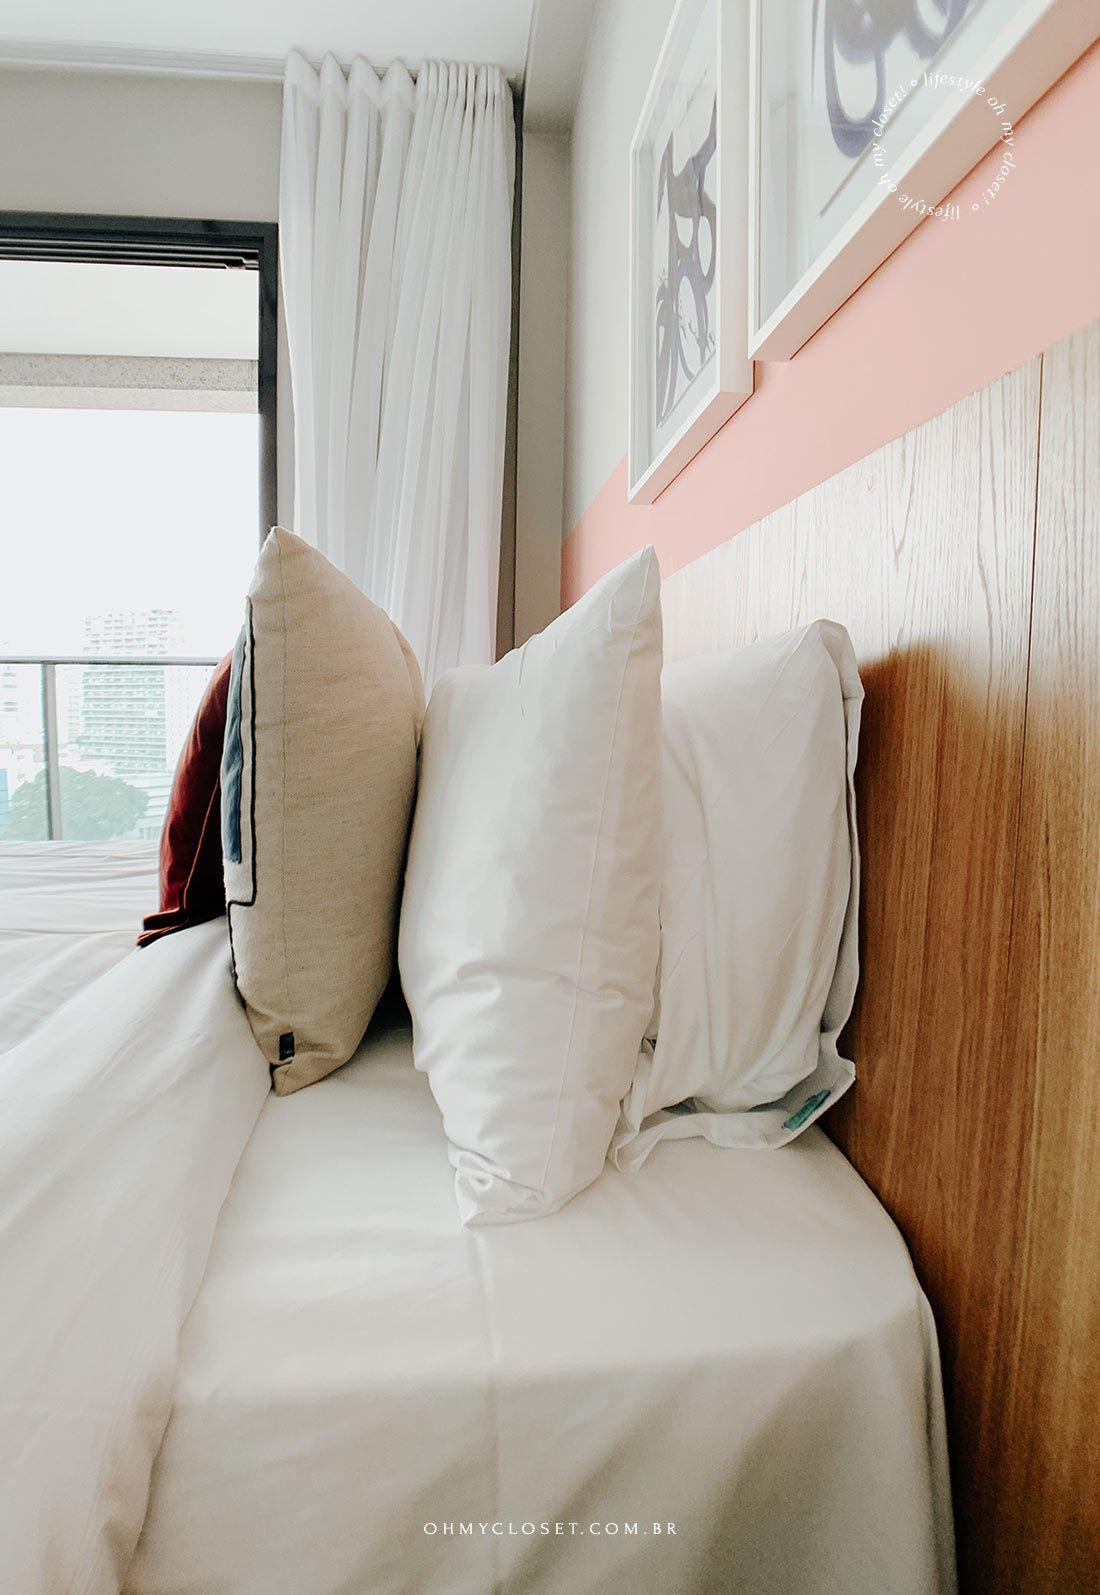 Travesseiros e almofadas de boa qualidade na cama.